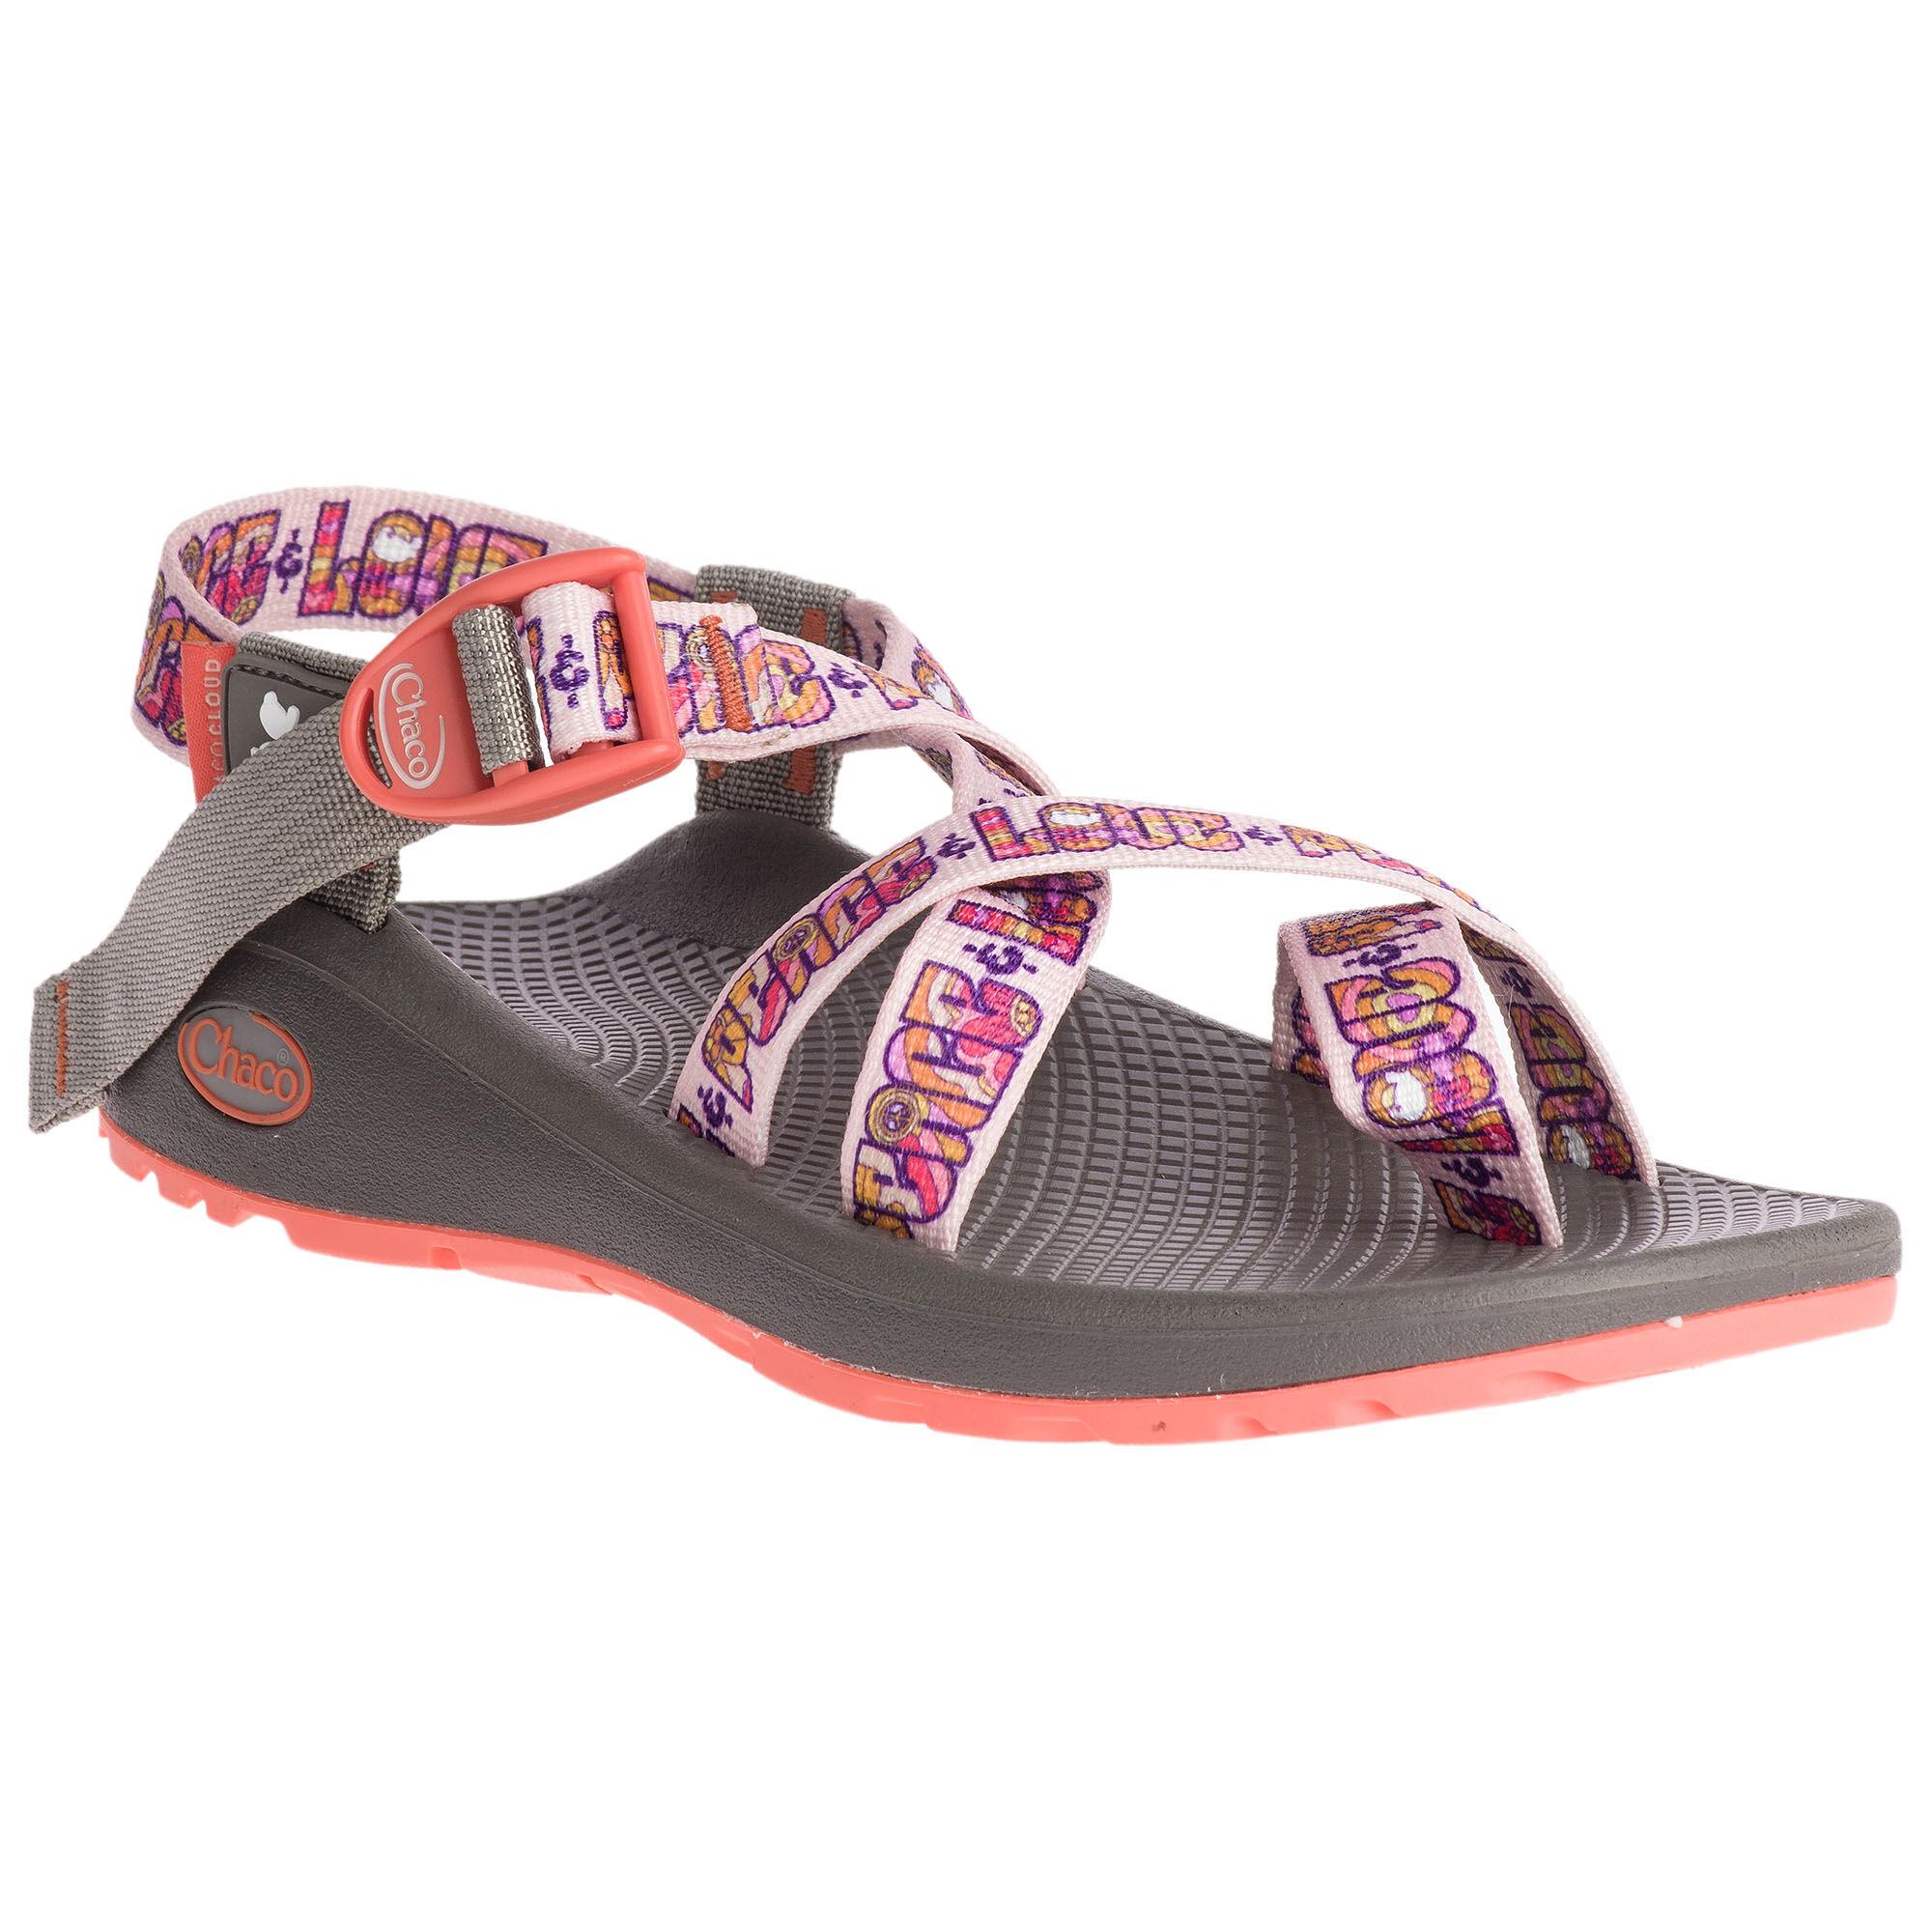 Chaco Women's Z/Cloud 2 Woodstock Sandals  - Peach Peace - Size: 7